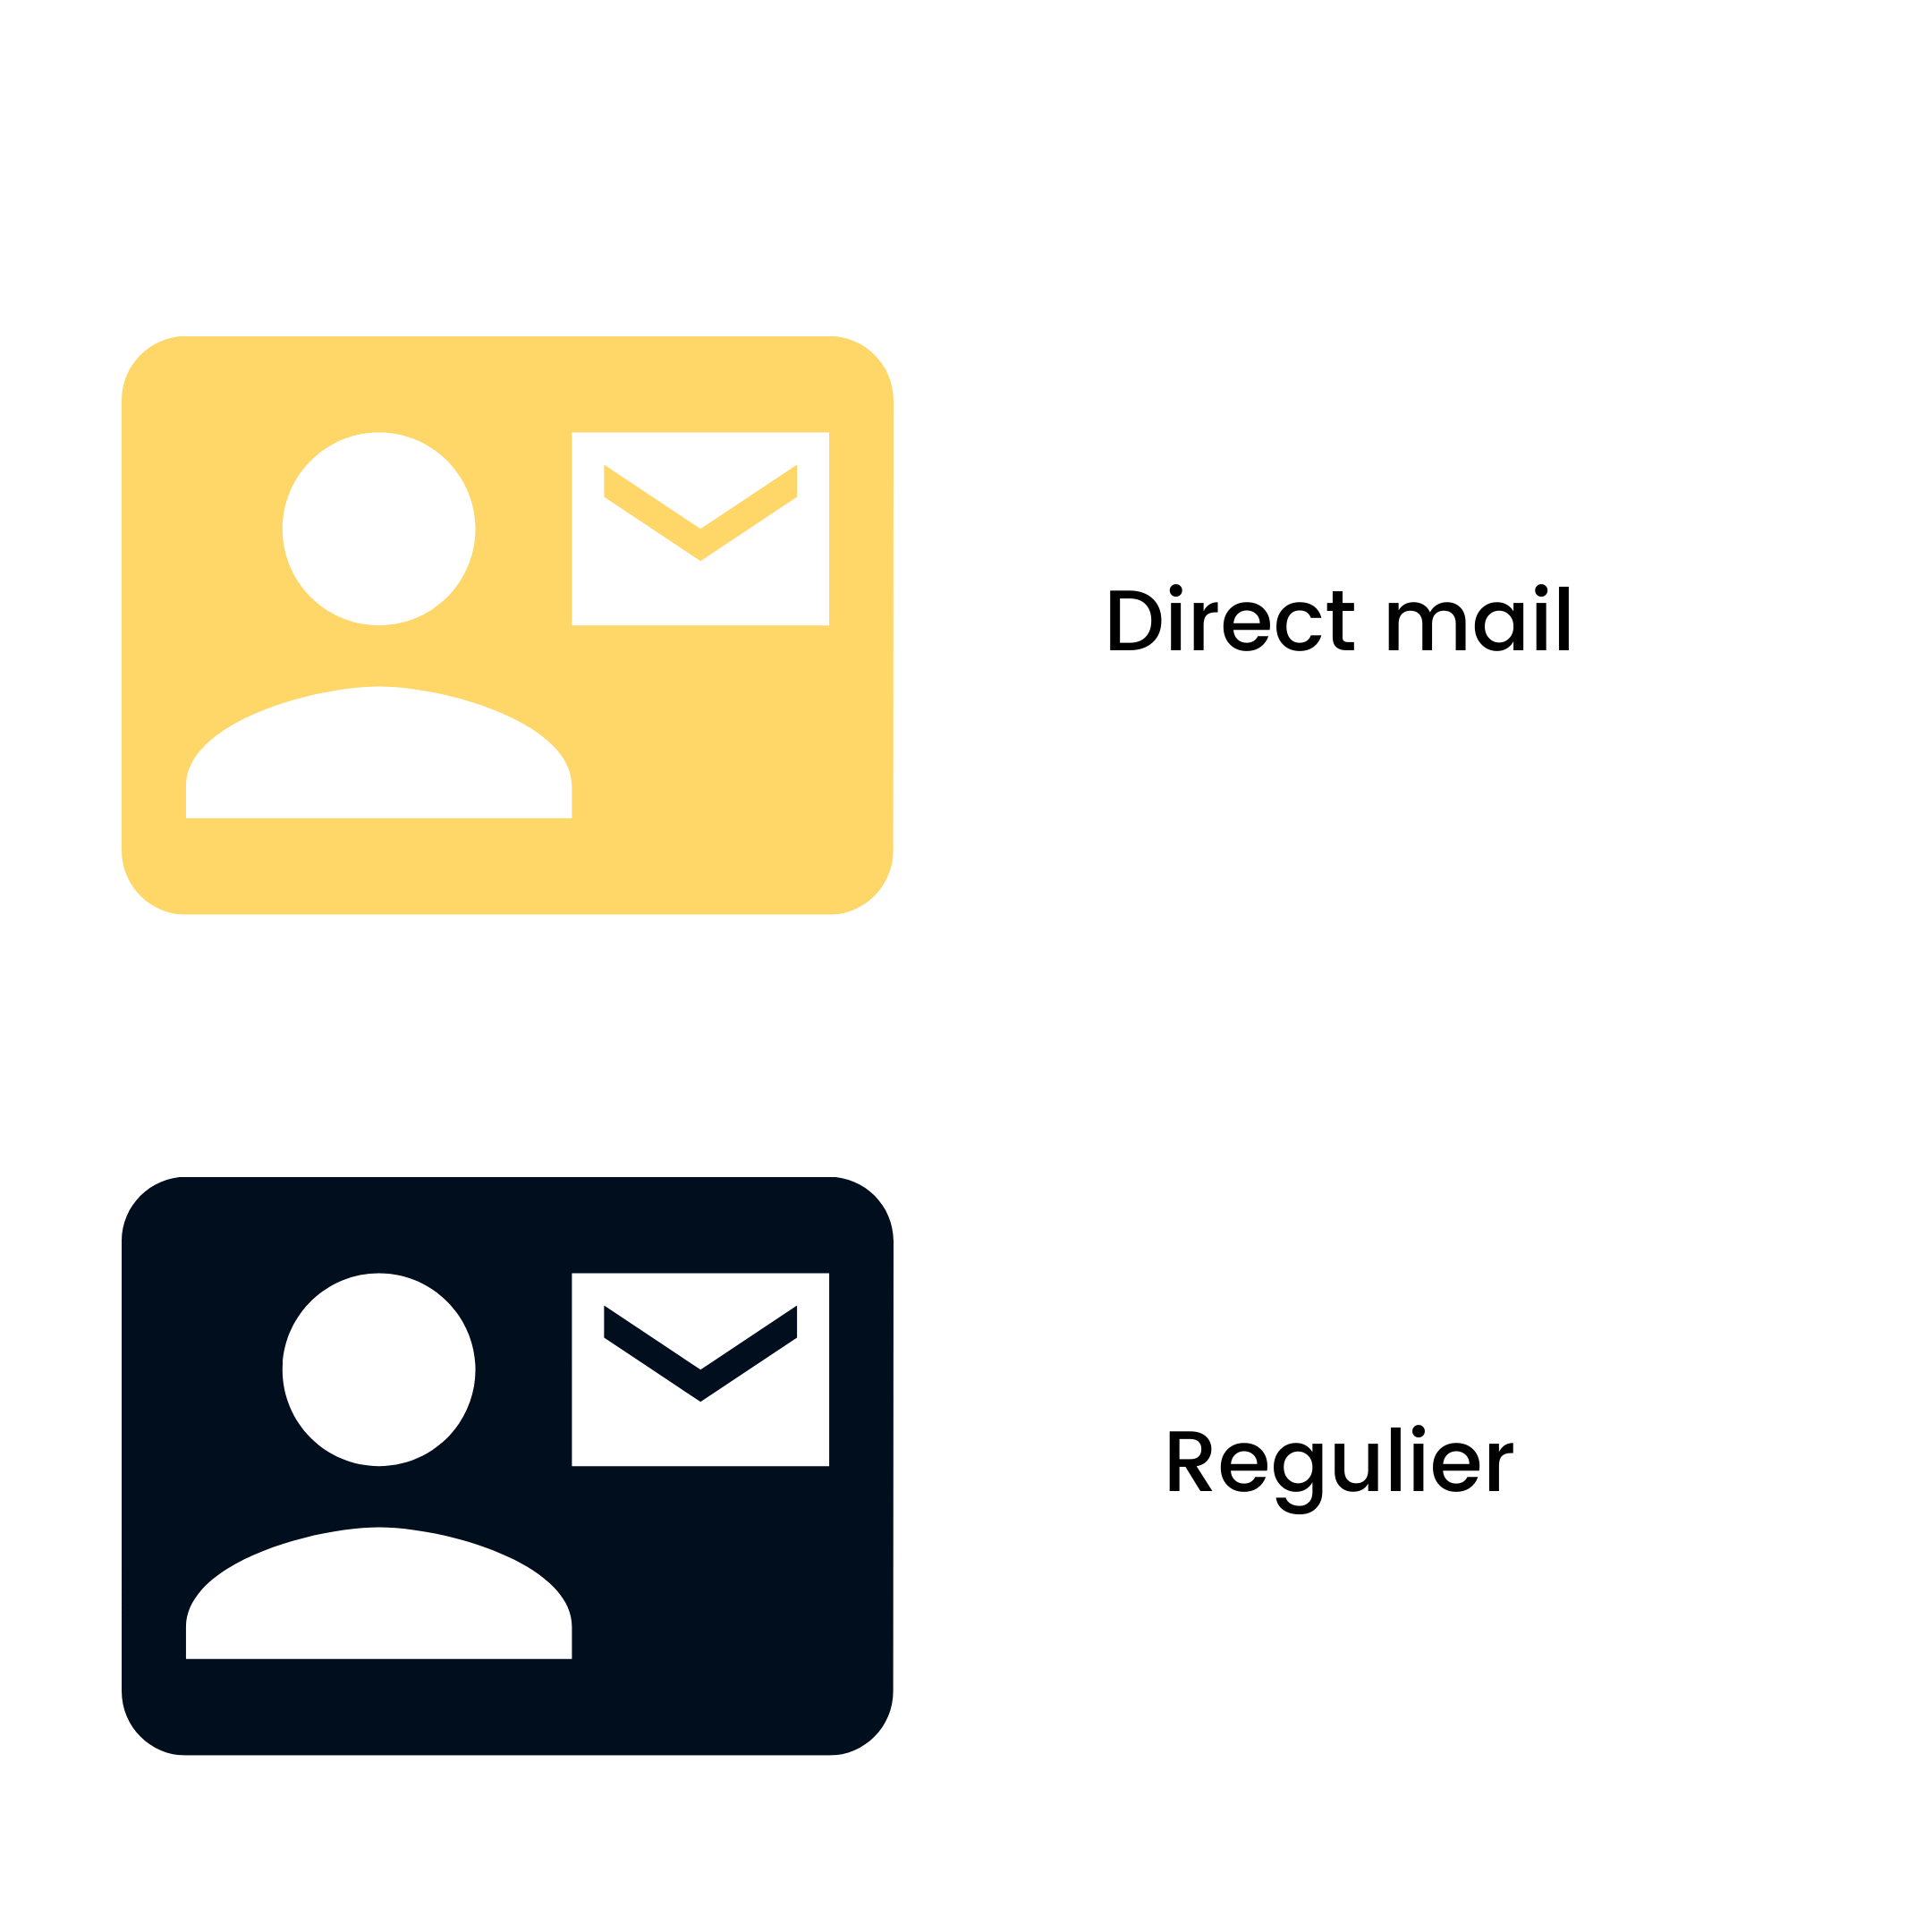 direct mail en regulier